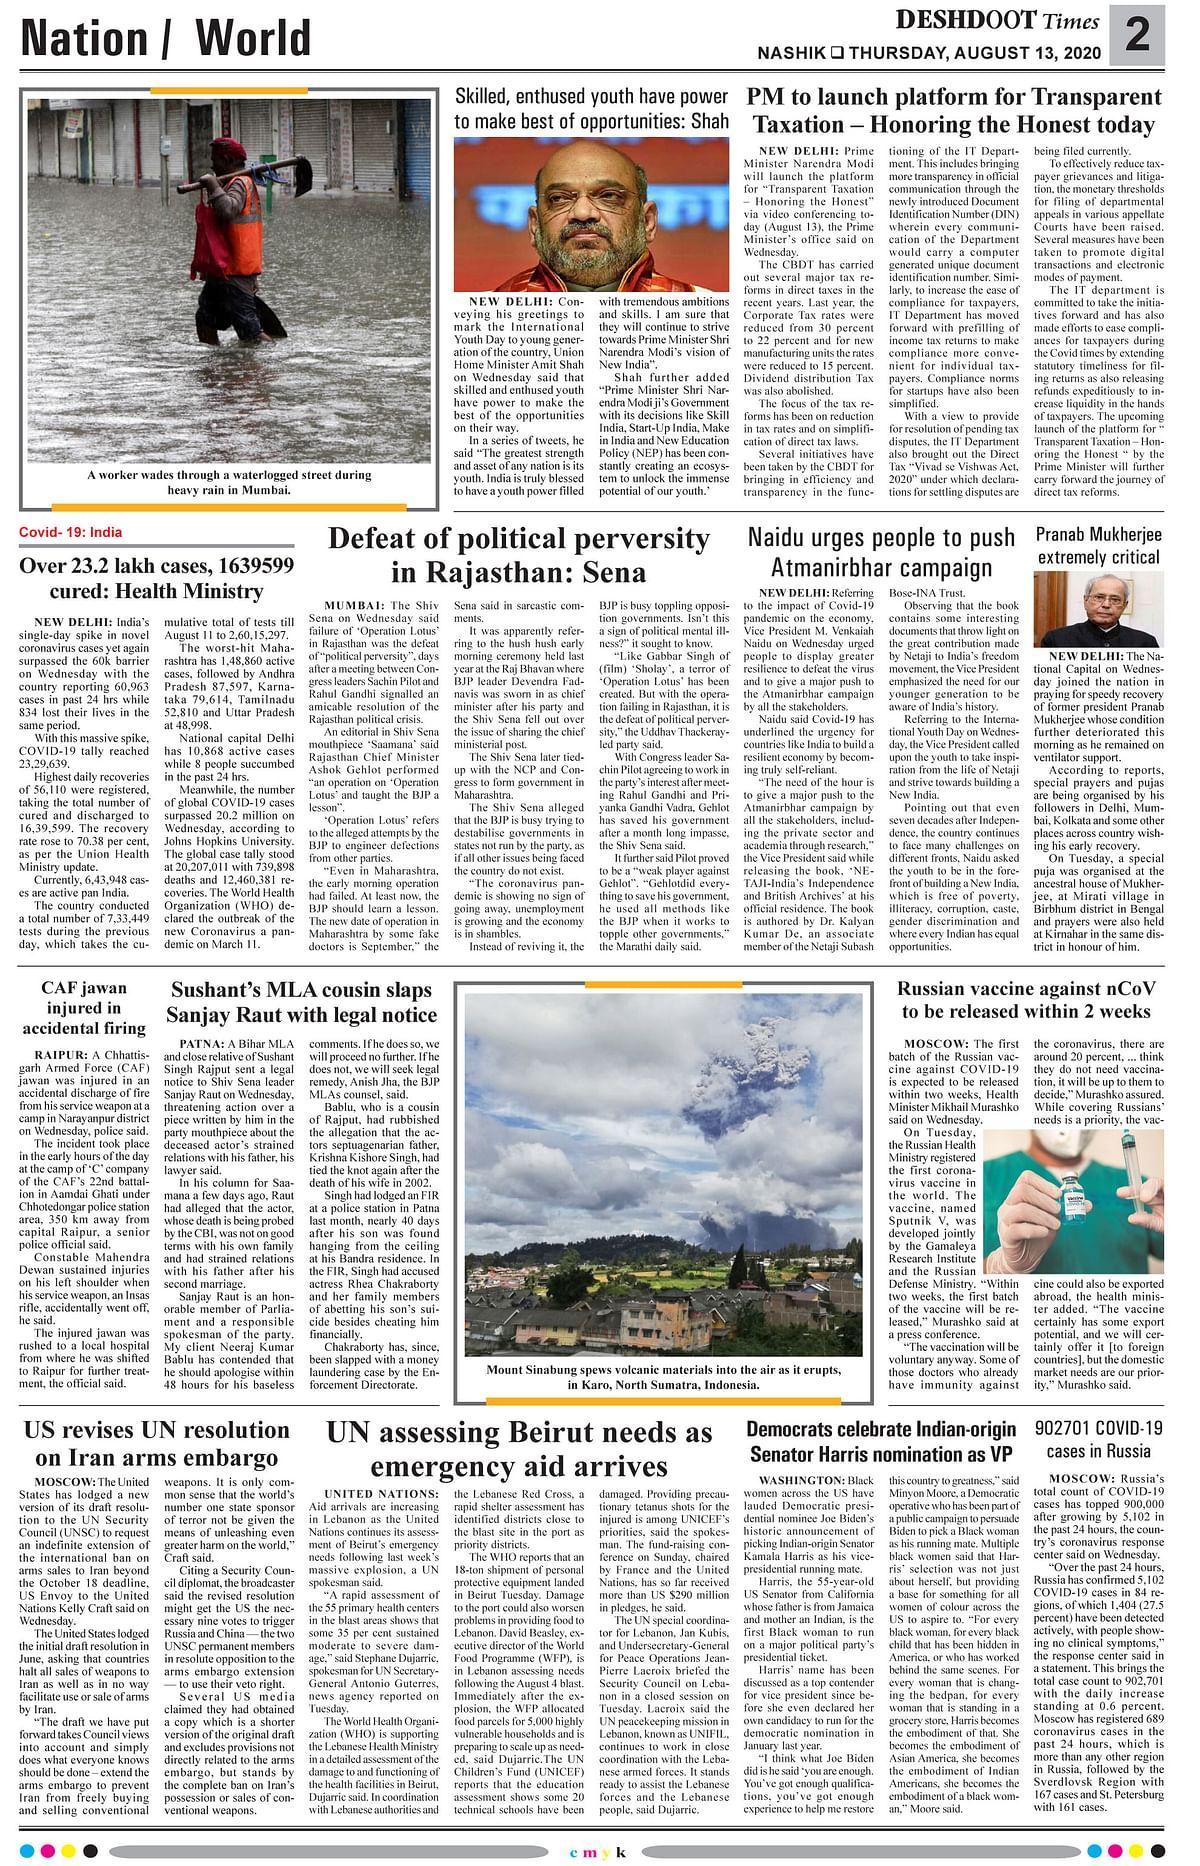 Deshdoot Times E Paper, 13 August 2020